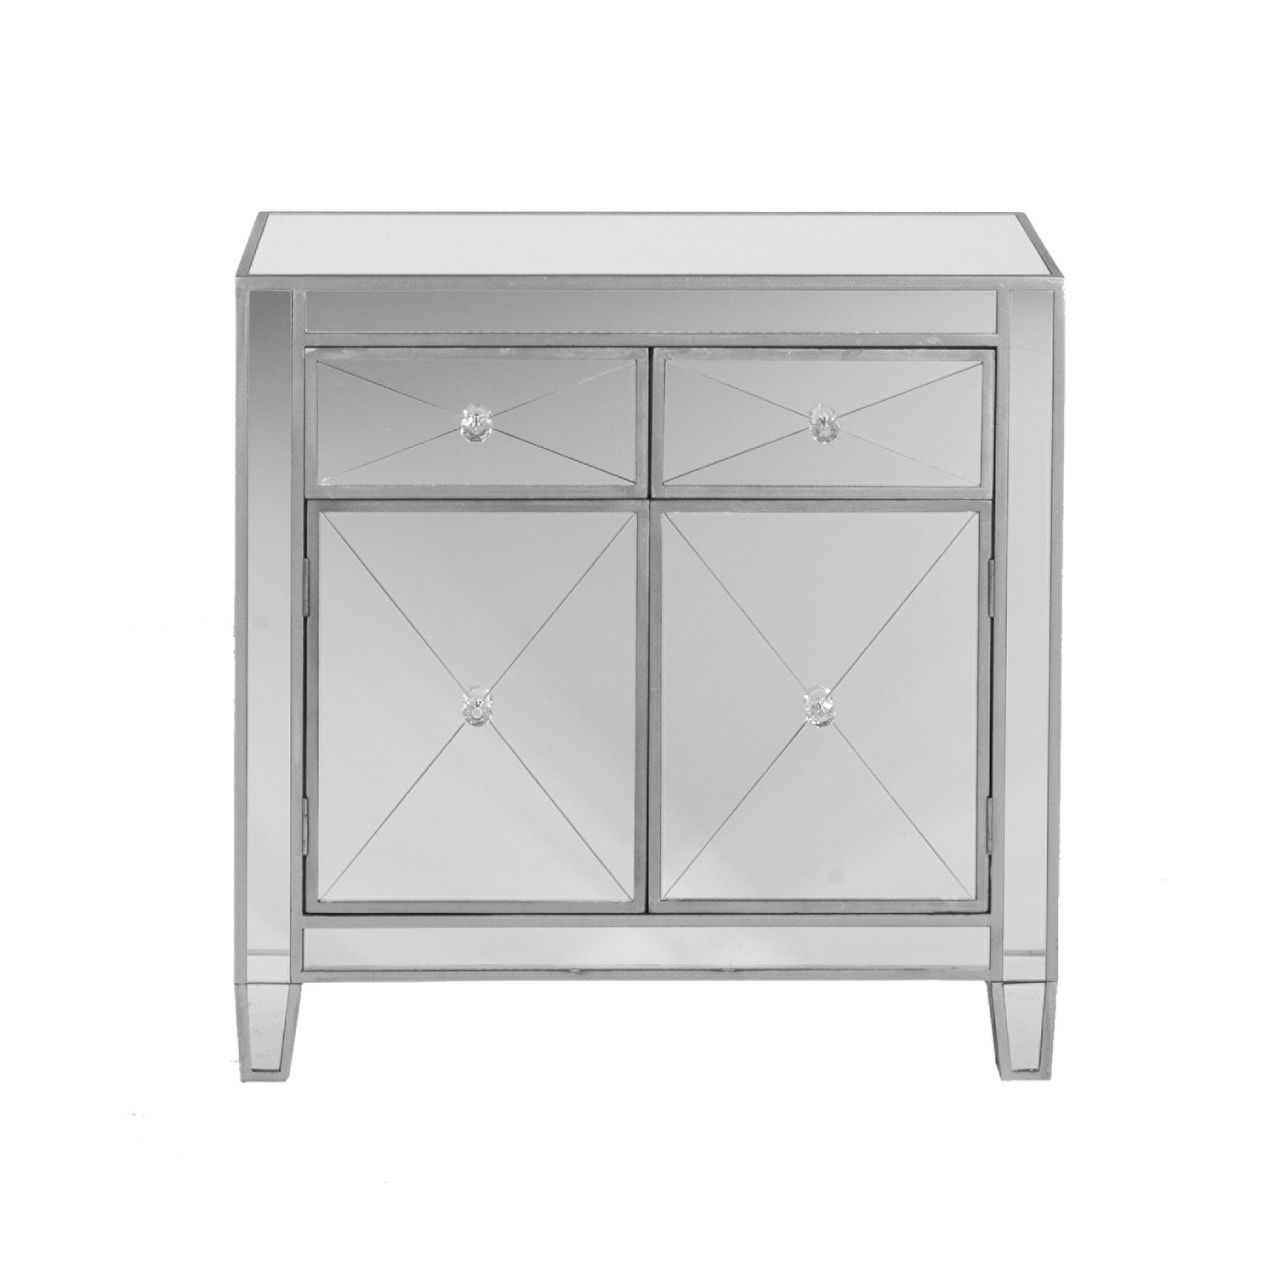 SEI Mirage Mirrored Cabinet in Metallic Silver